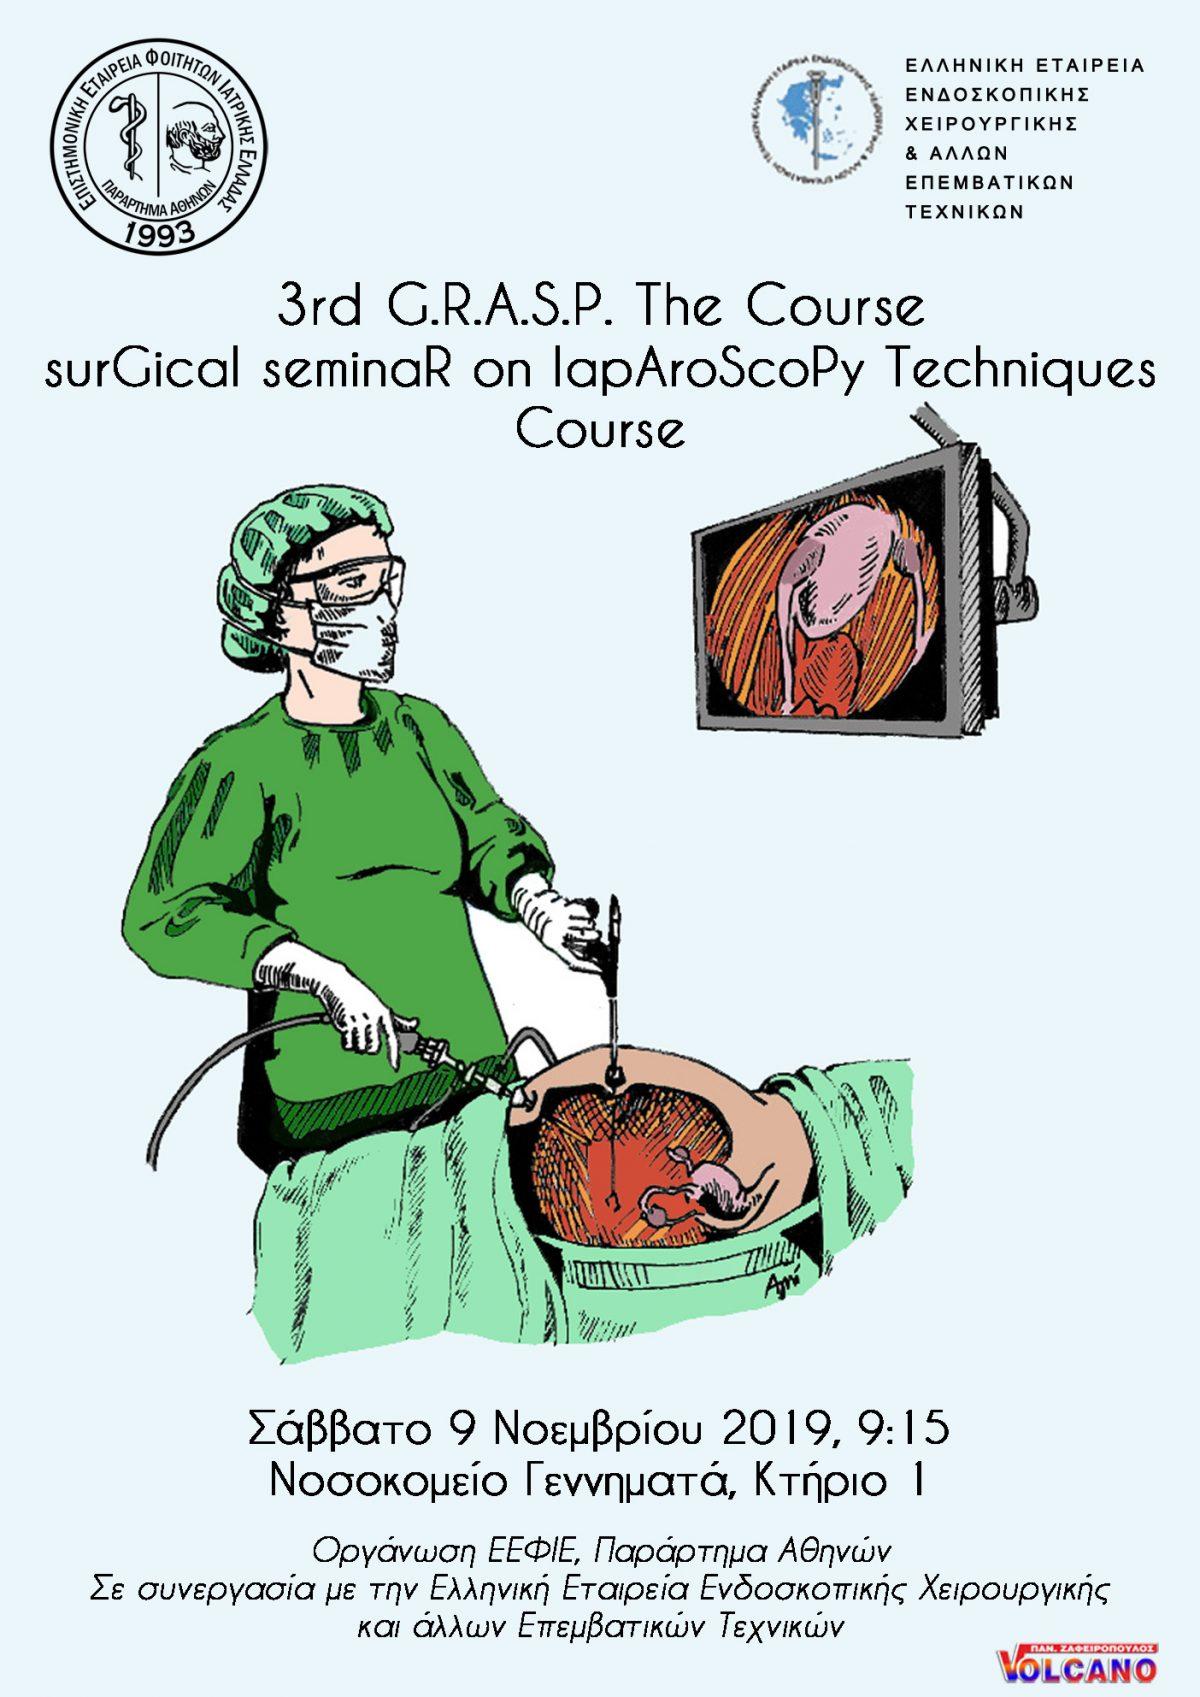 3rd surGical seminaR on lAparoScoPy Techniques Course | G.R.A.S.P.-3